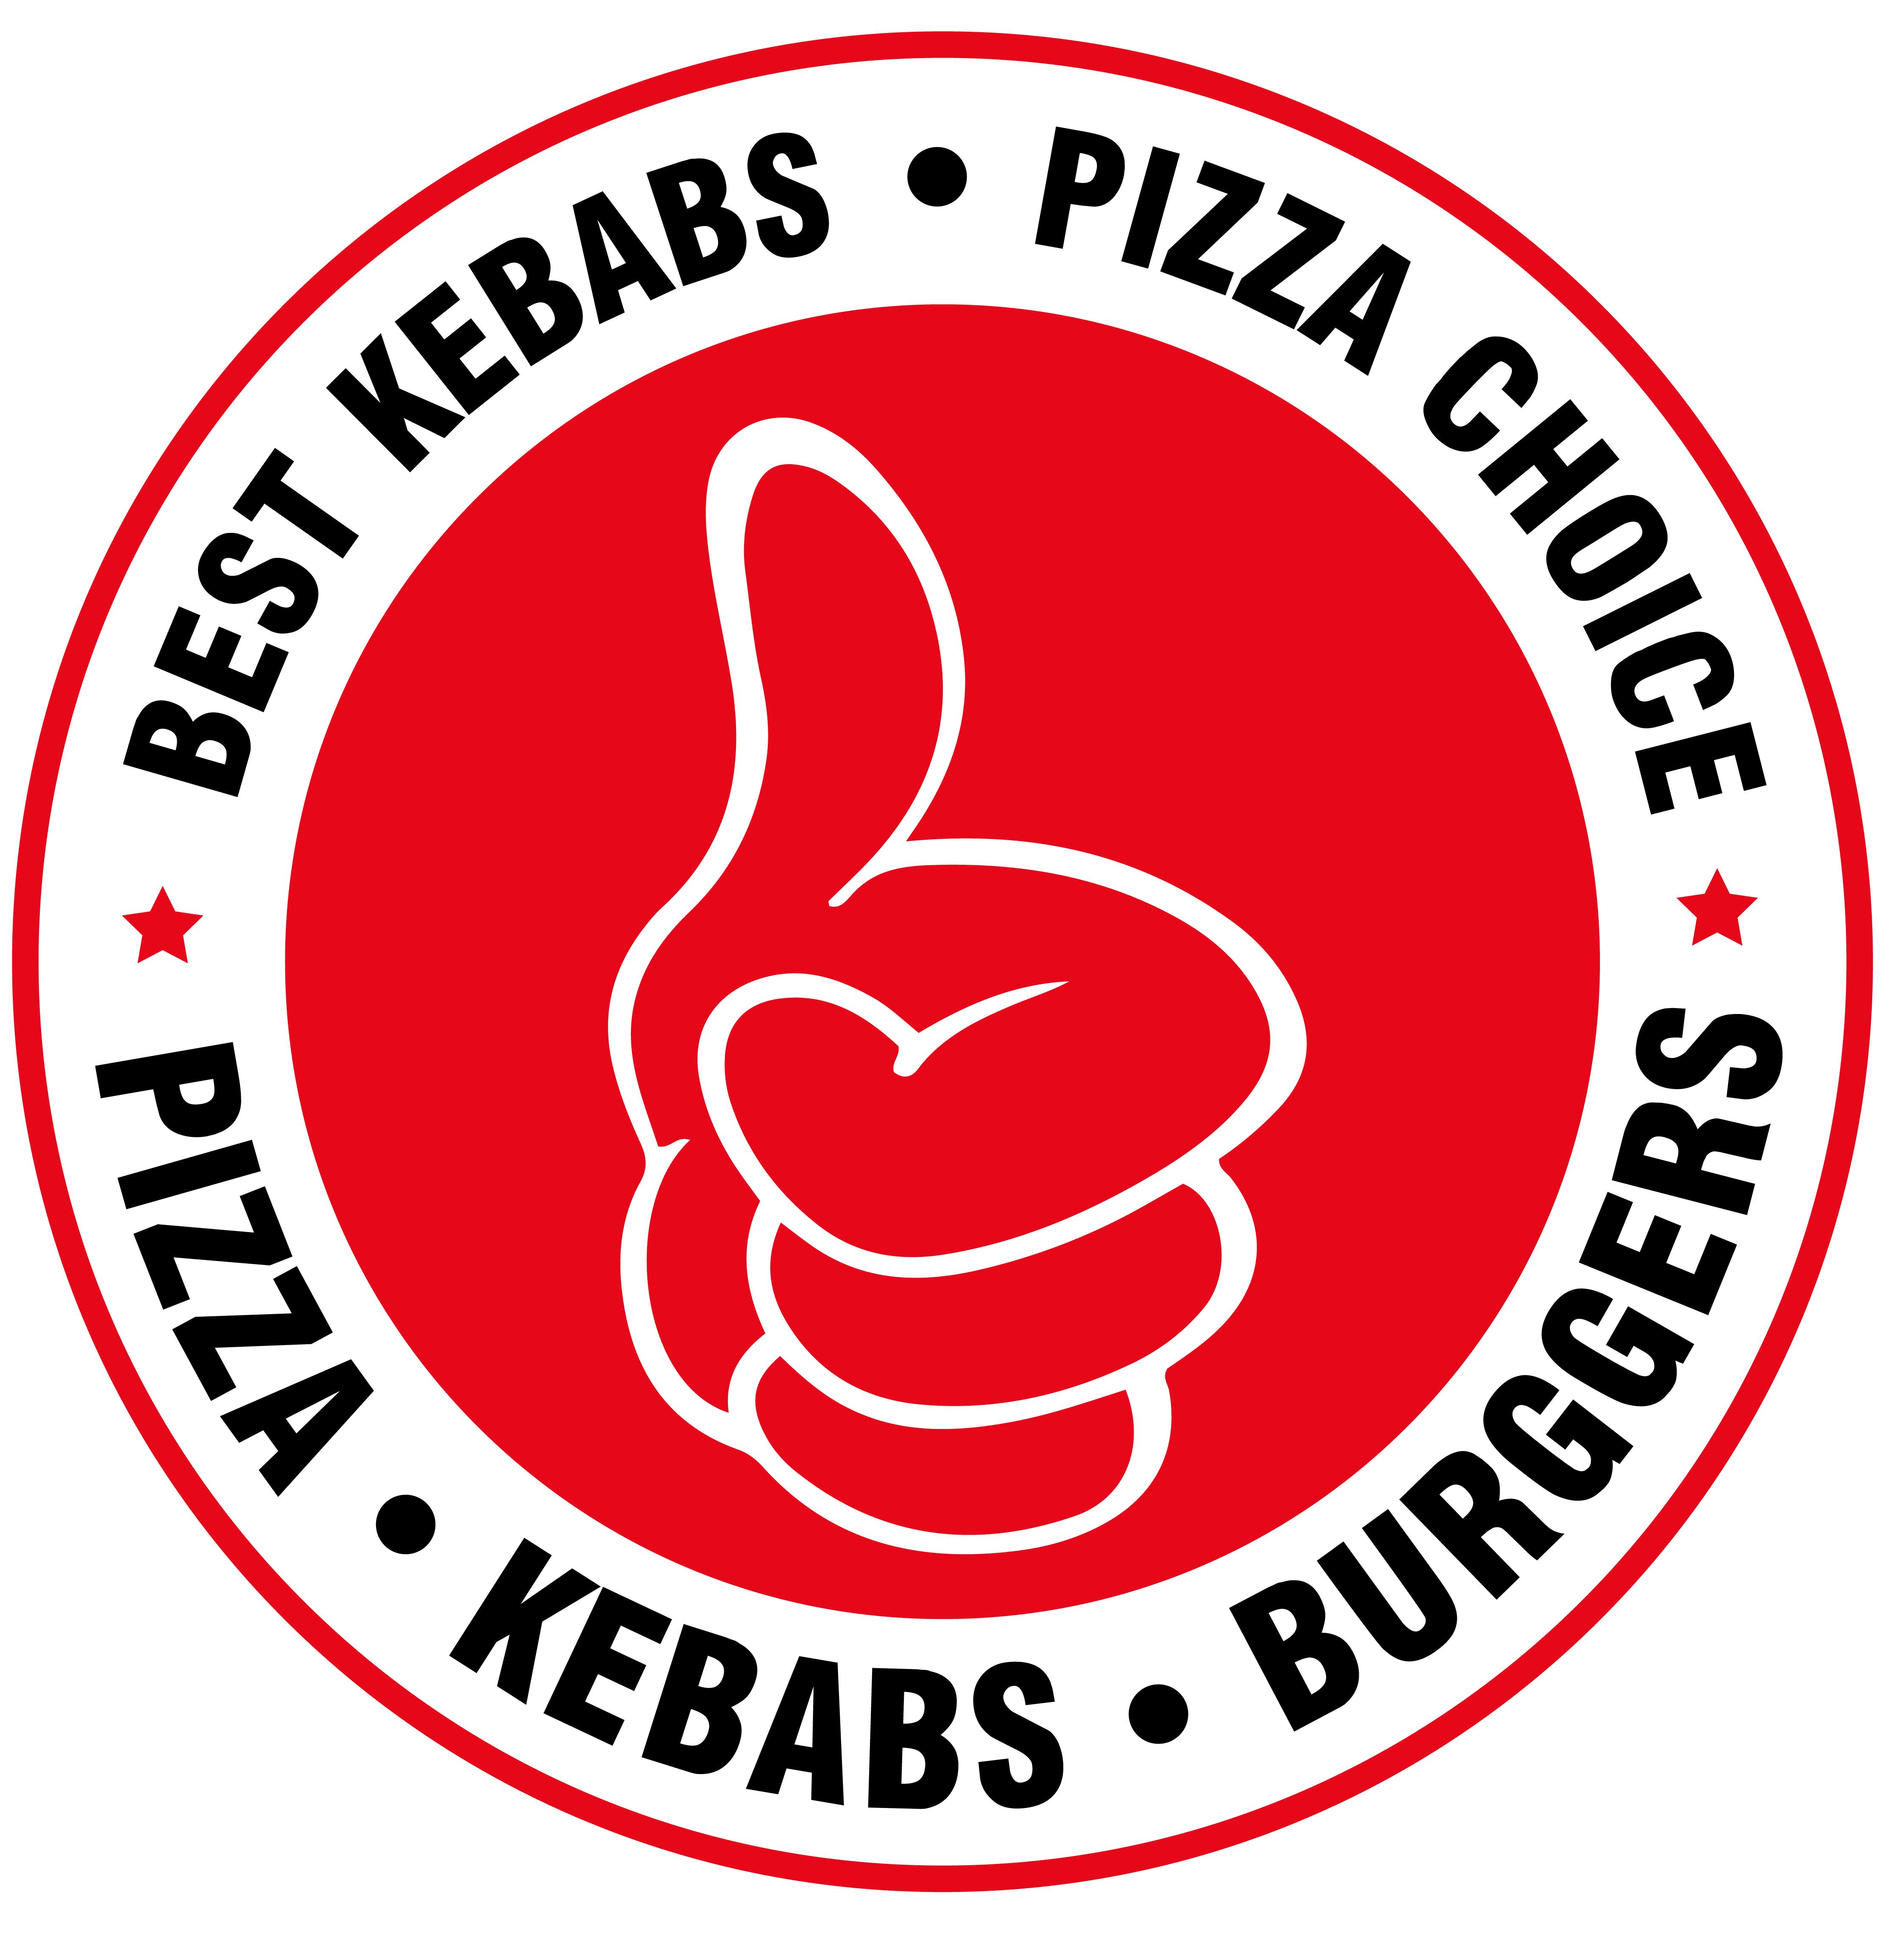 Best Kebab Pizza Choice Best Kebab Pizza Choice